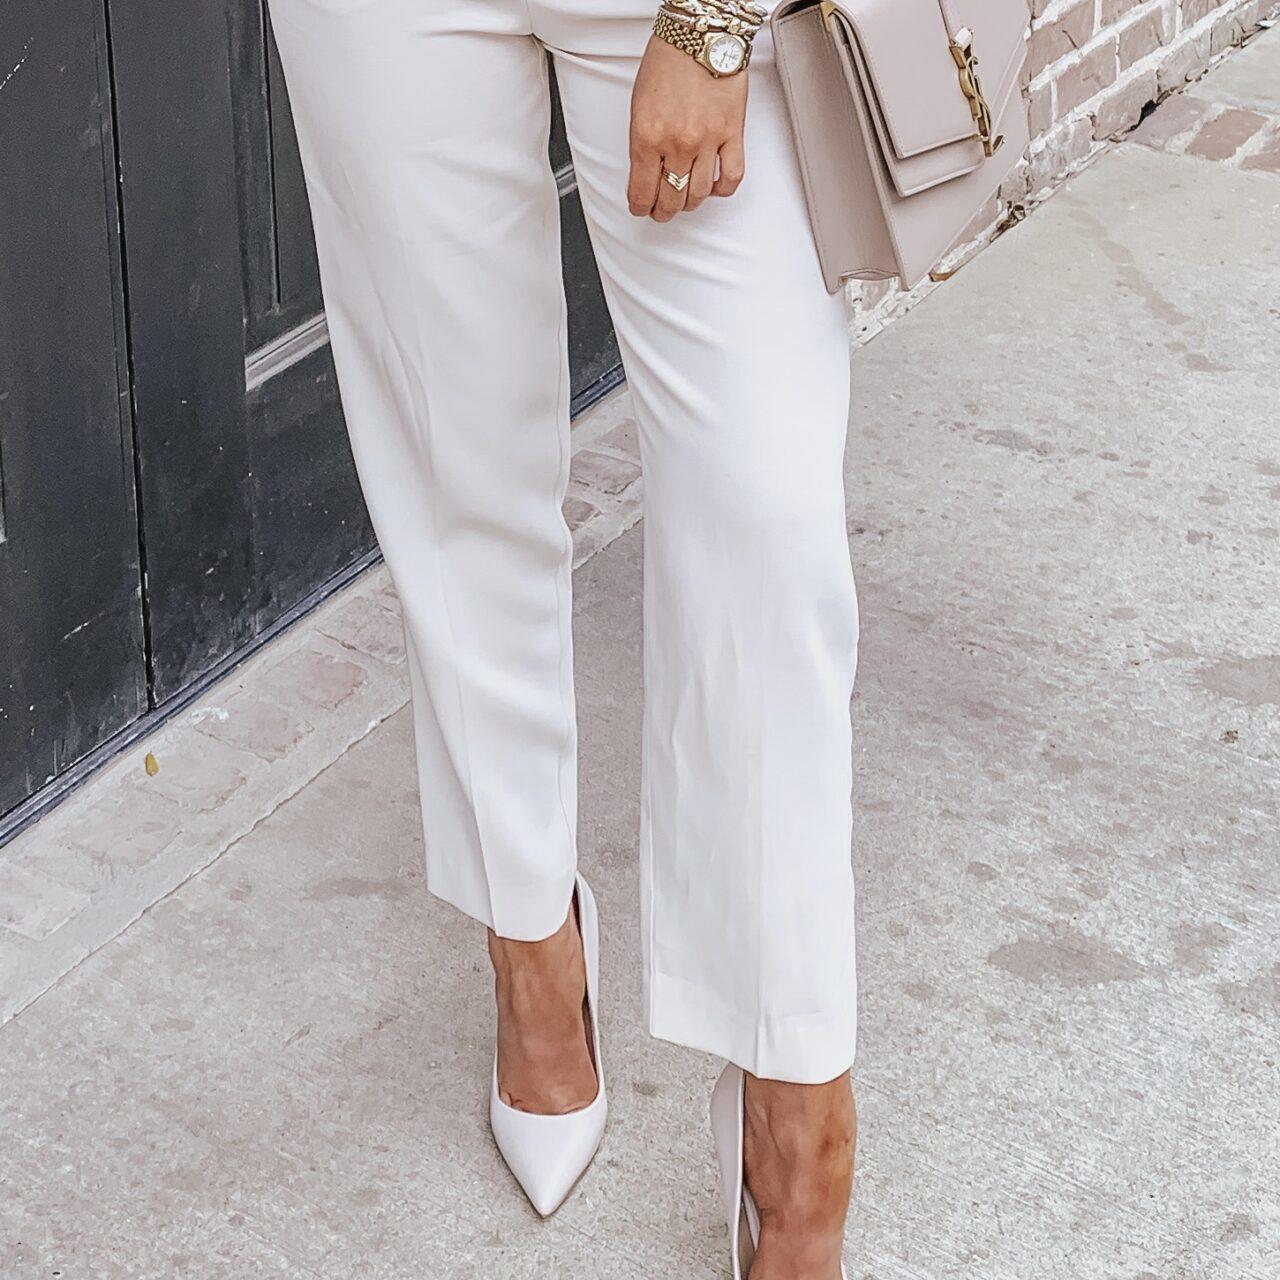 White Shoe Trend